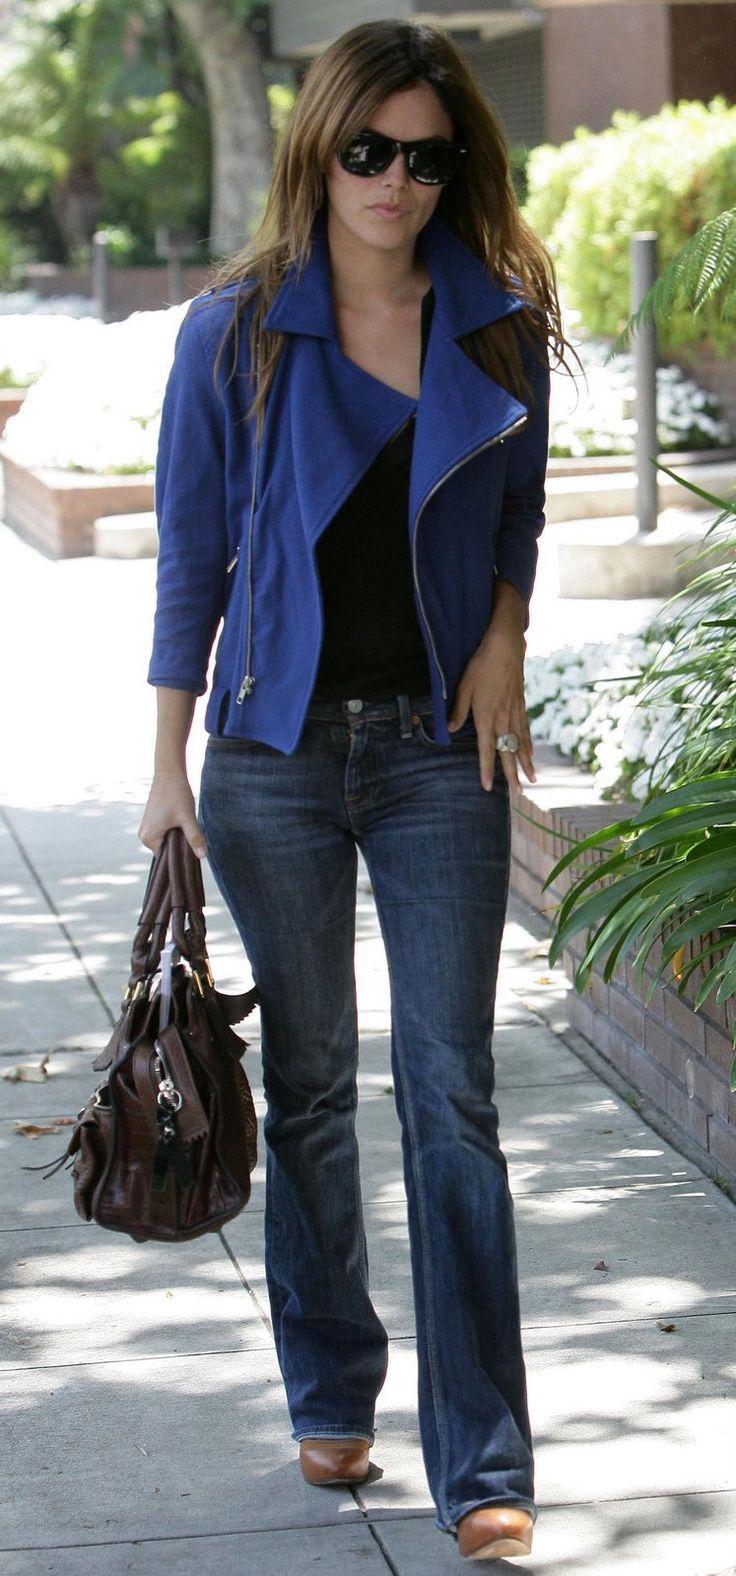 Blue jacket, jeans, brown shoes, black shirt